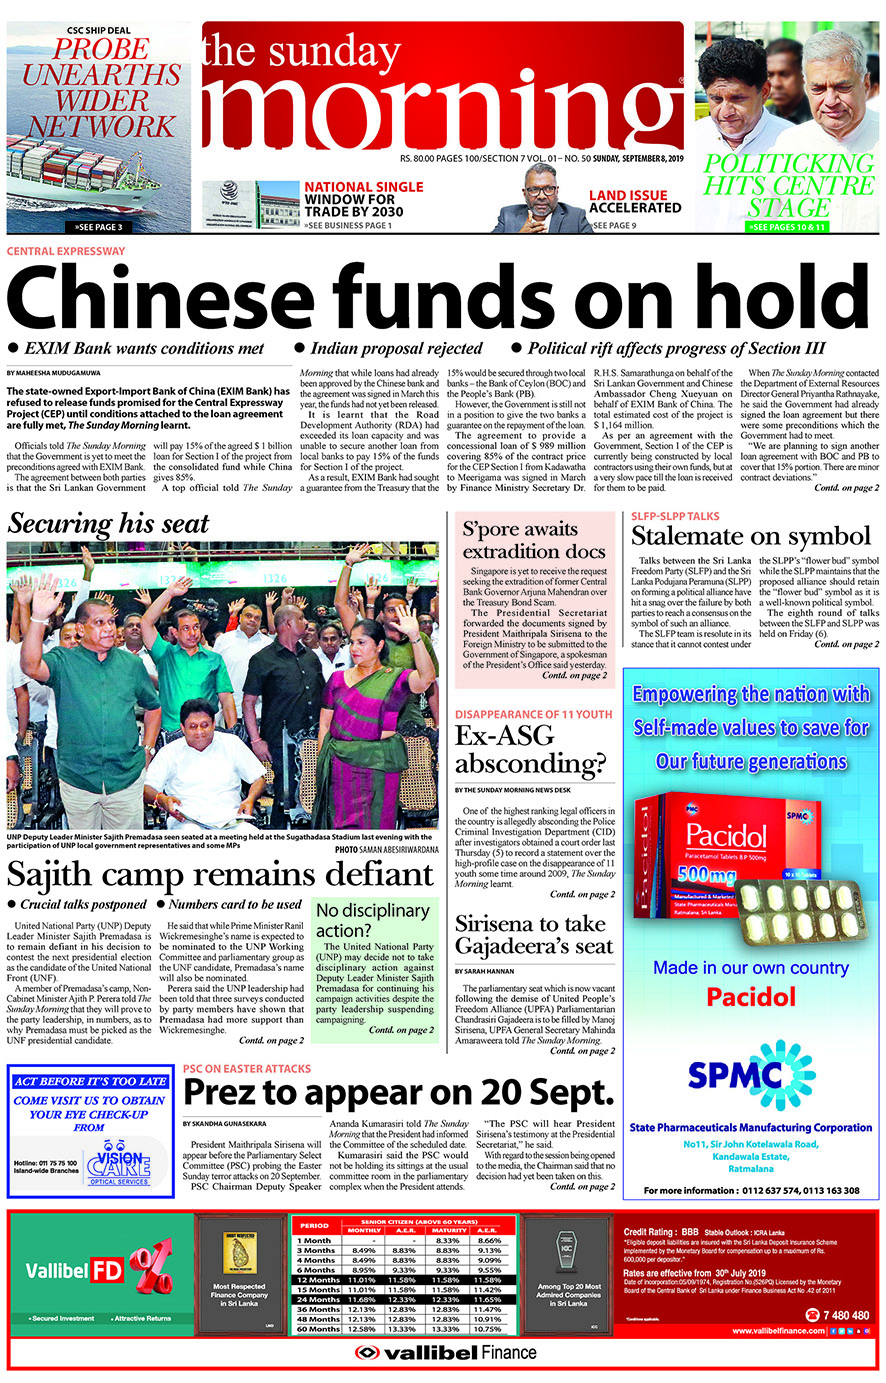 Sri Lanka News   Latest Breaking News Updates - Top Stories